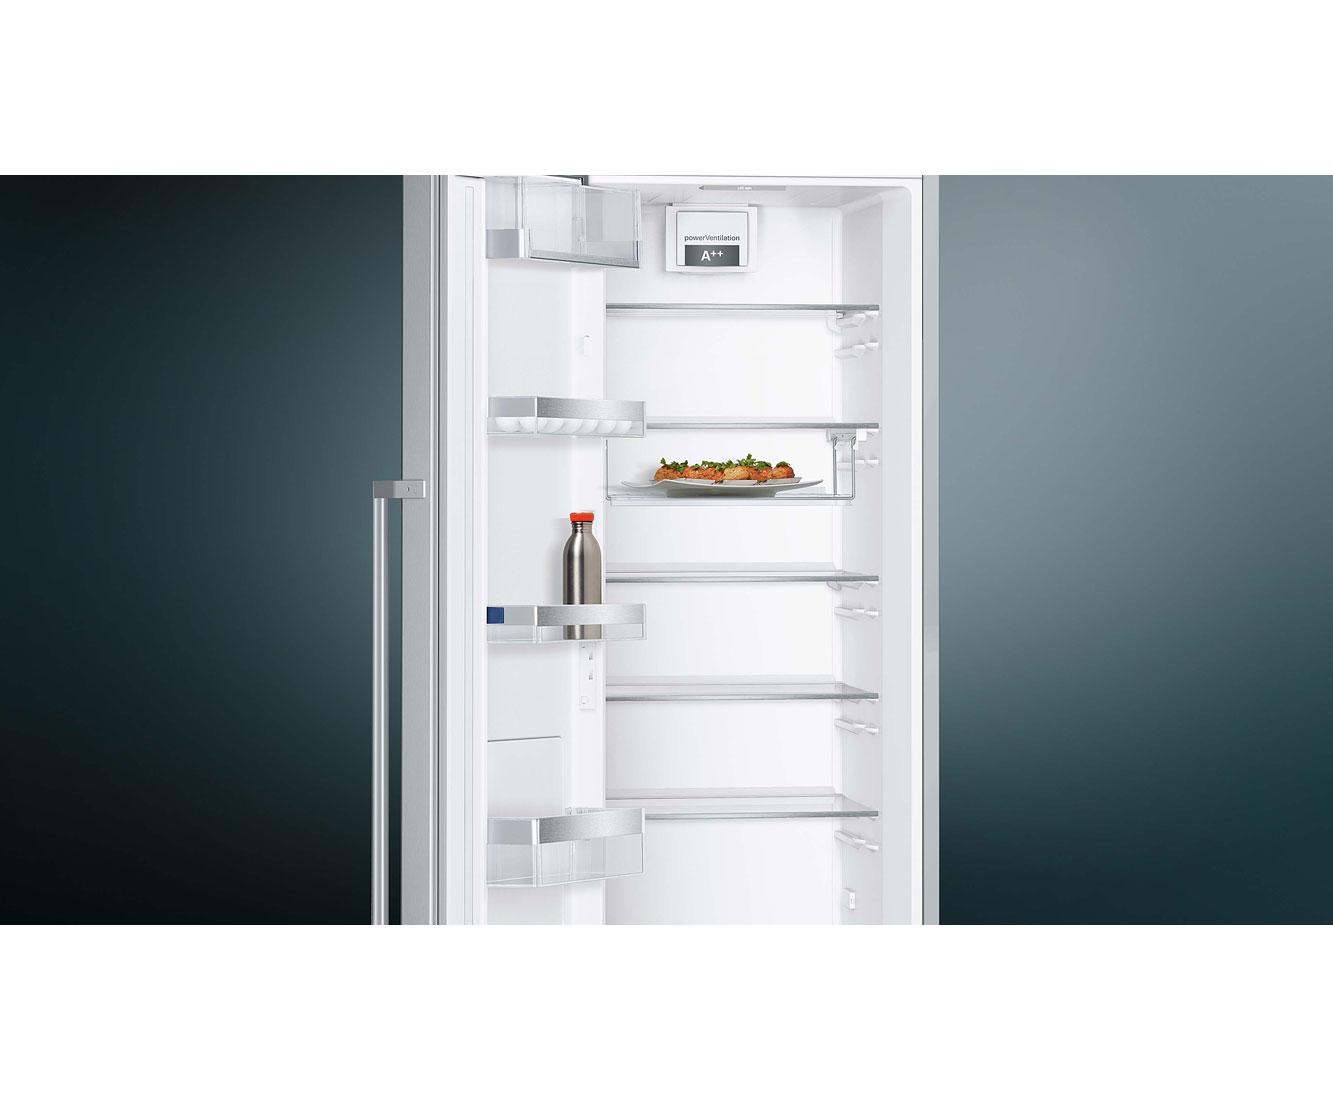 Siemens Family Line Kühlschrank : Siemens iq ks wbi p kühlschrank edelstahl a